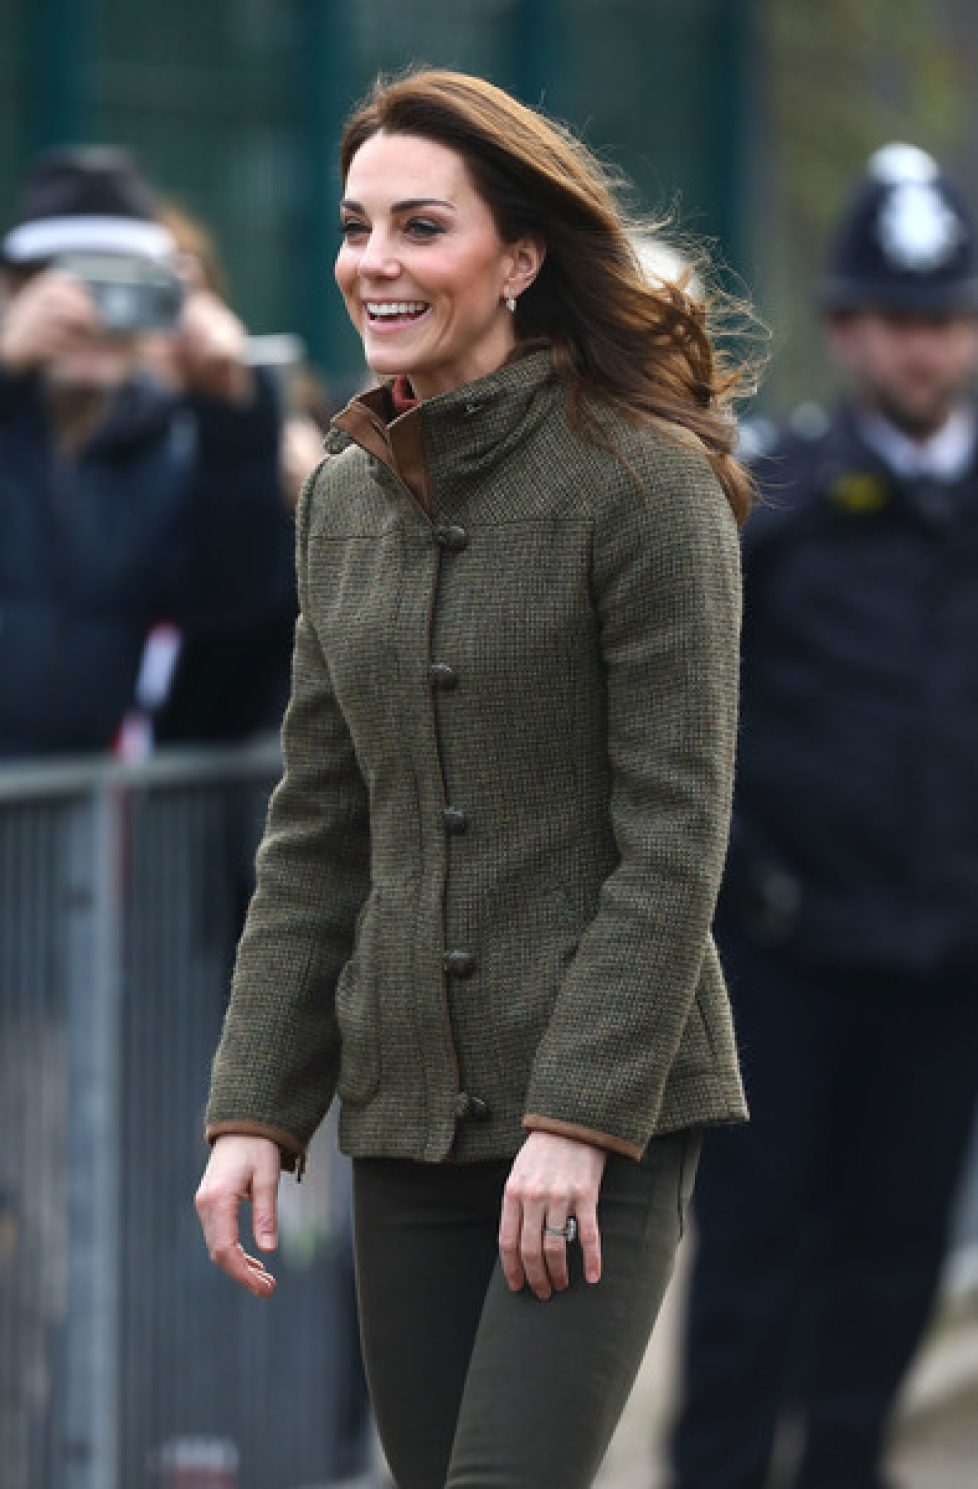 Duchess+Cambridge+Visits+Islington+Community+uno3yshr6qJl